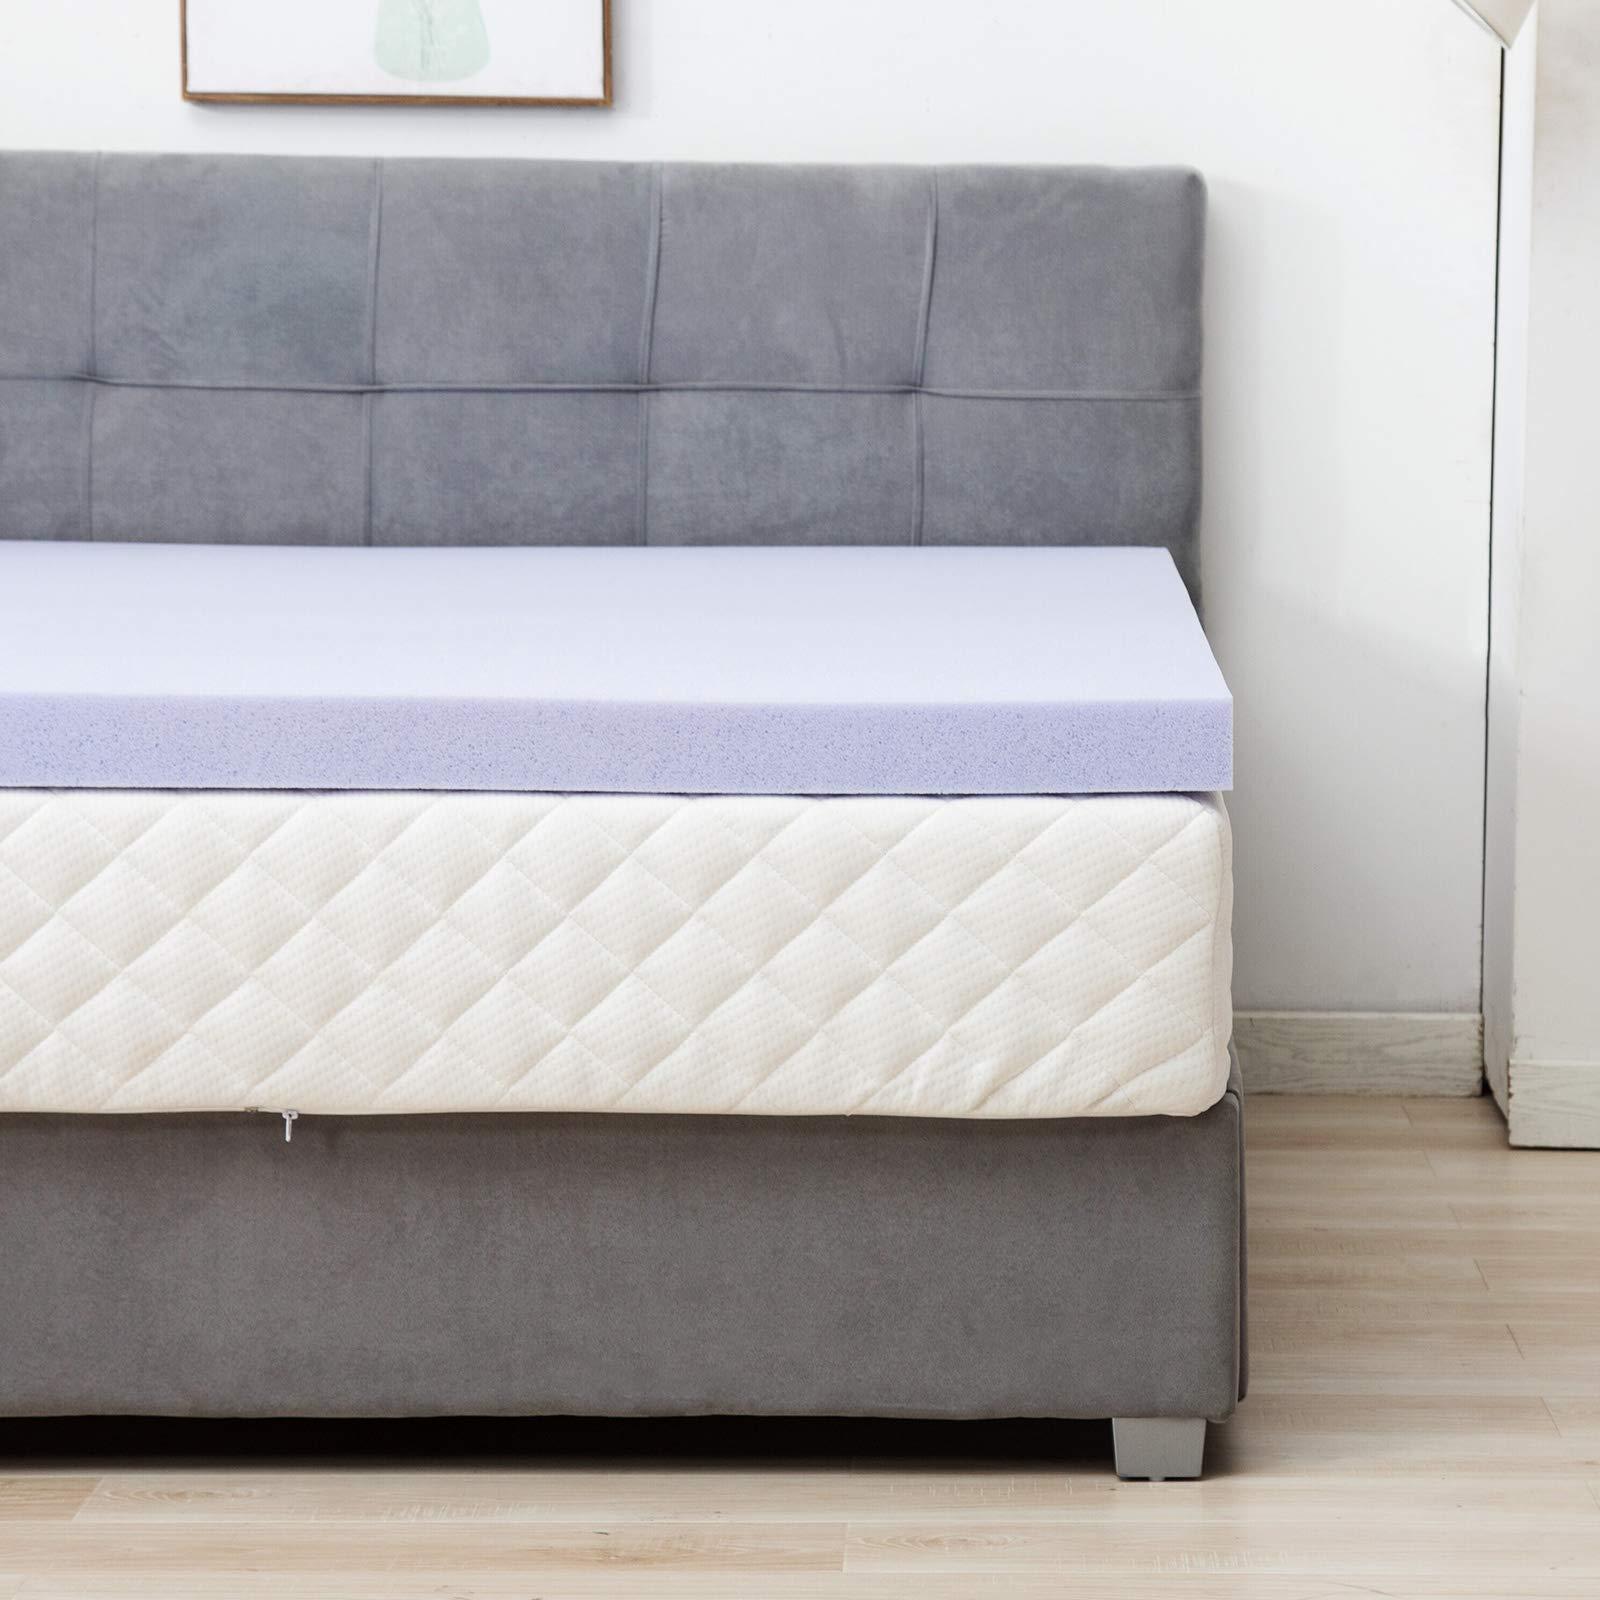 Mecor 4 Inch 4'' Mattress Topper Full Size-100% Gel Infused Memory Foam Mattress Topper w/CertiPUR-US Certified Foam, Pressure-Relieving Bed Topper Purple